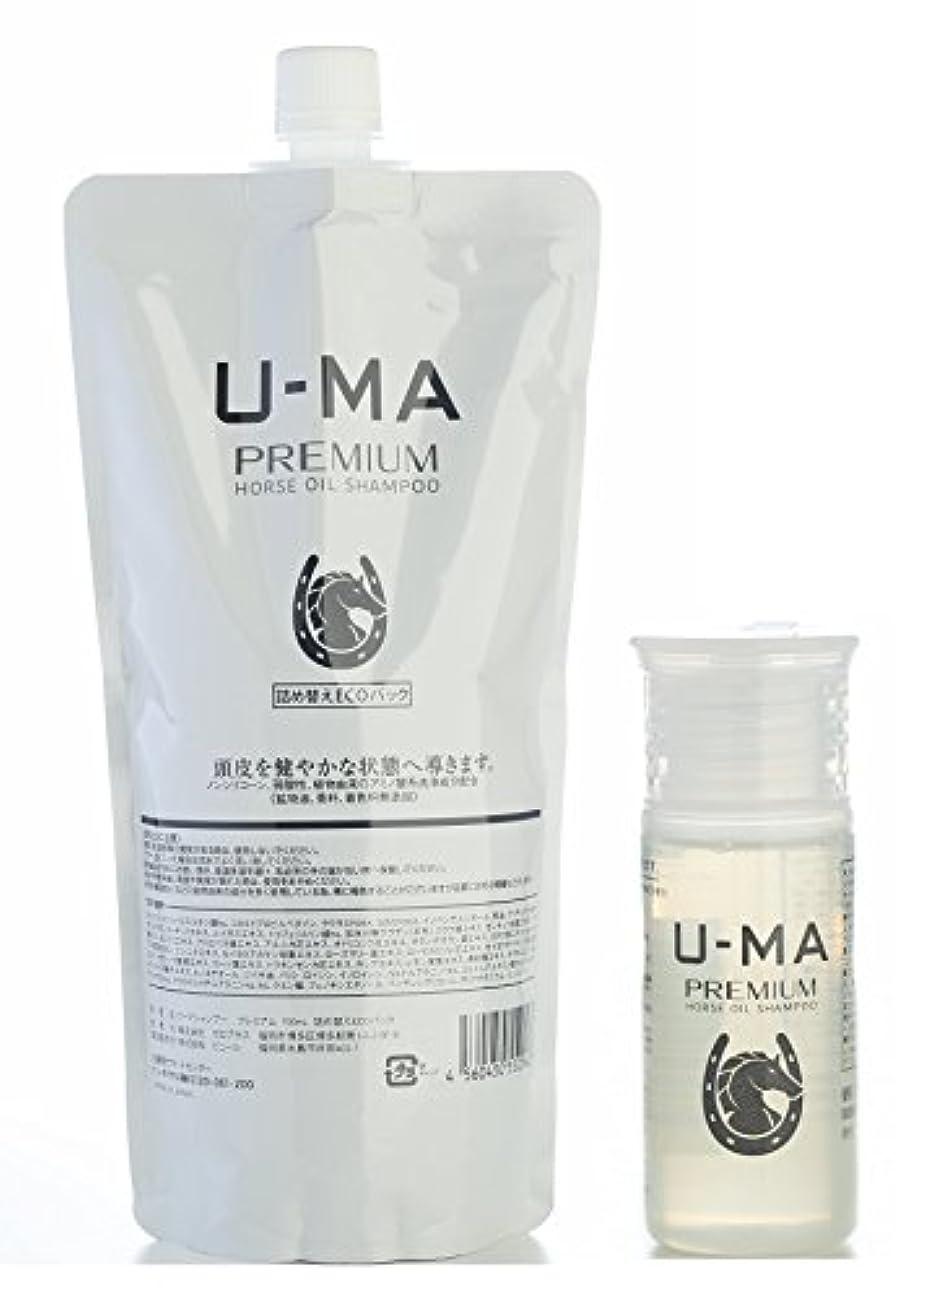 U-MA ウーマシャンプープレミアム 詰め替え 700ml (約5ヶ月分) & シャンプー ミニボトル 30ml